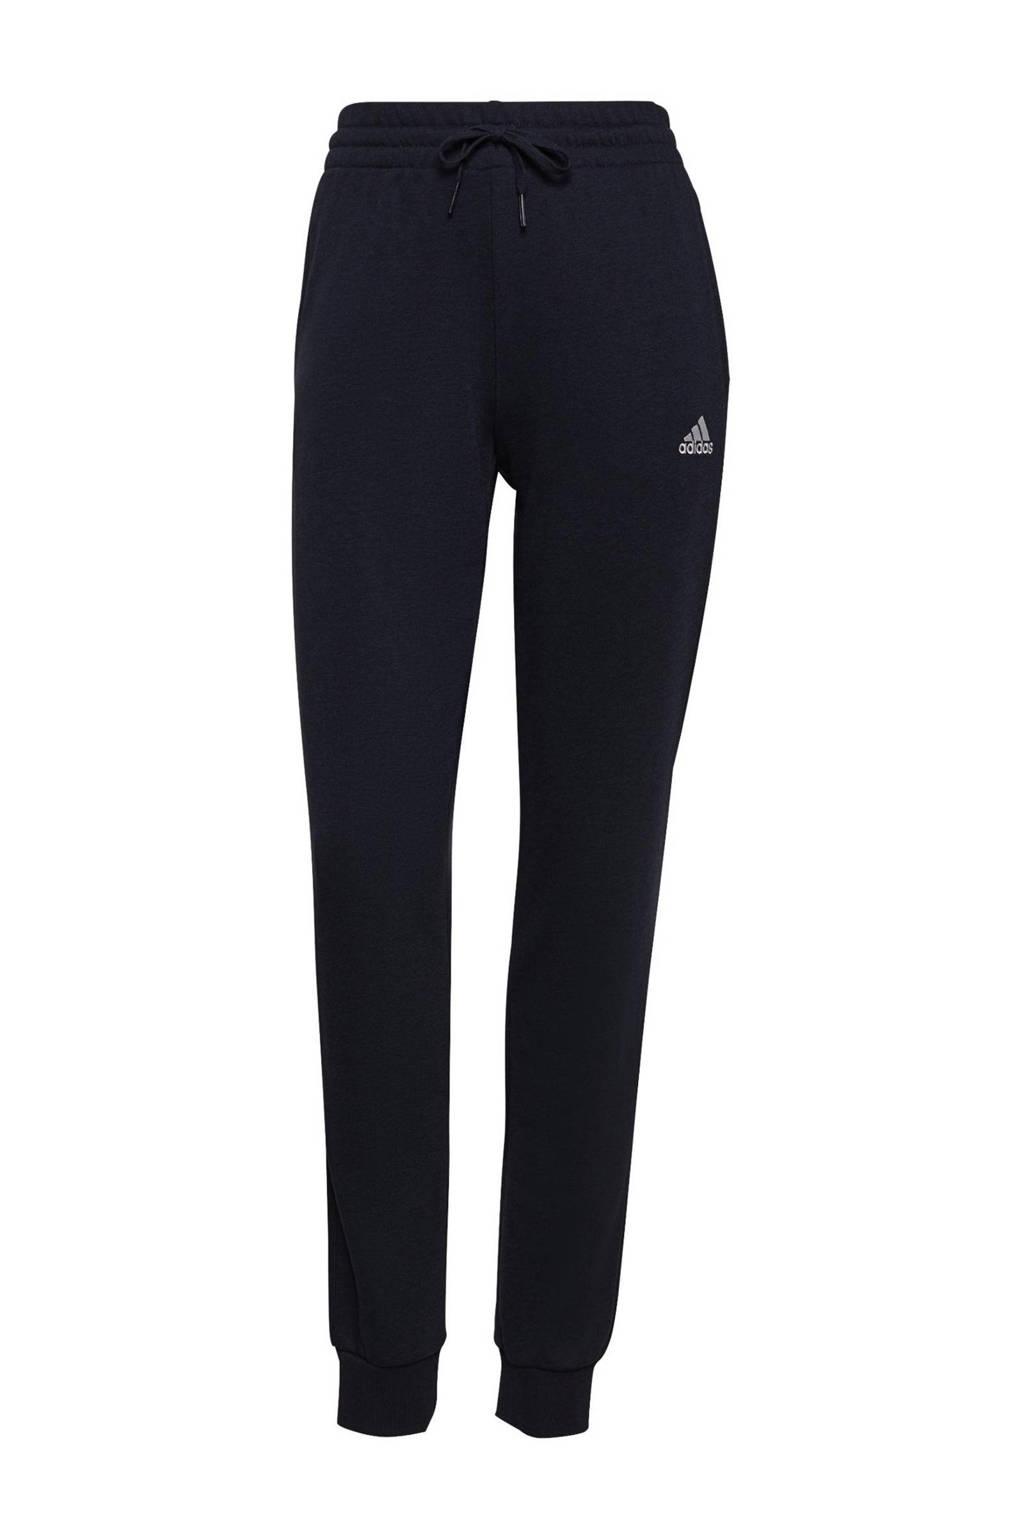 adidas Performance joggingbroek zwart/wit, Donkerblauw/wit